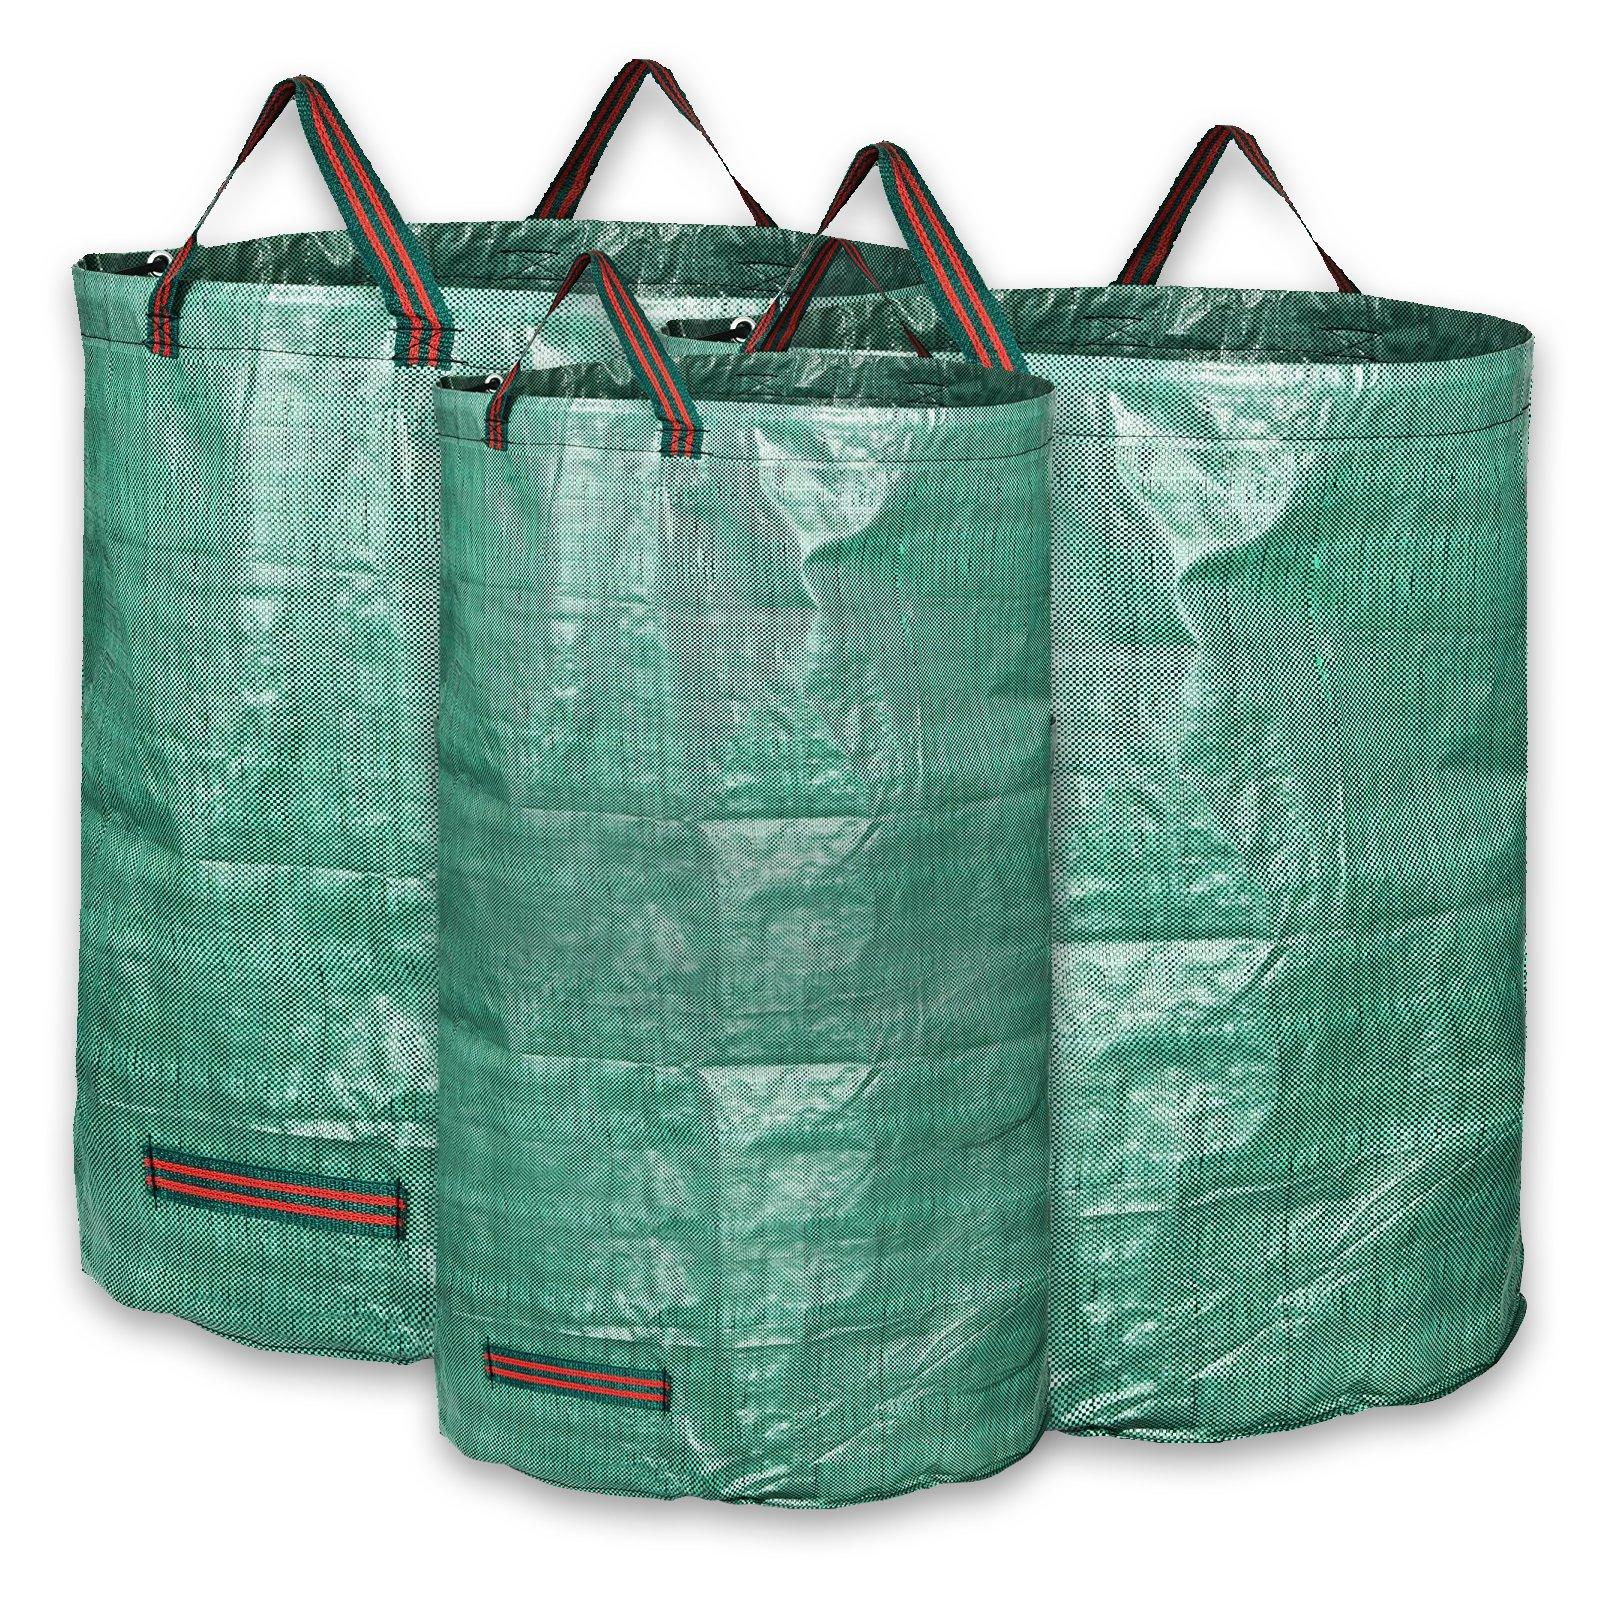 KORAM 3-Pack Garden Waste Bags Reusable Gardening Bag Collapsible Yard Lawn Leaf Bag - 2x 72 Gallons, 1x 32 Gallons - Garden Gifts for Men & Women by KORAM